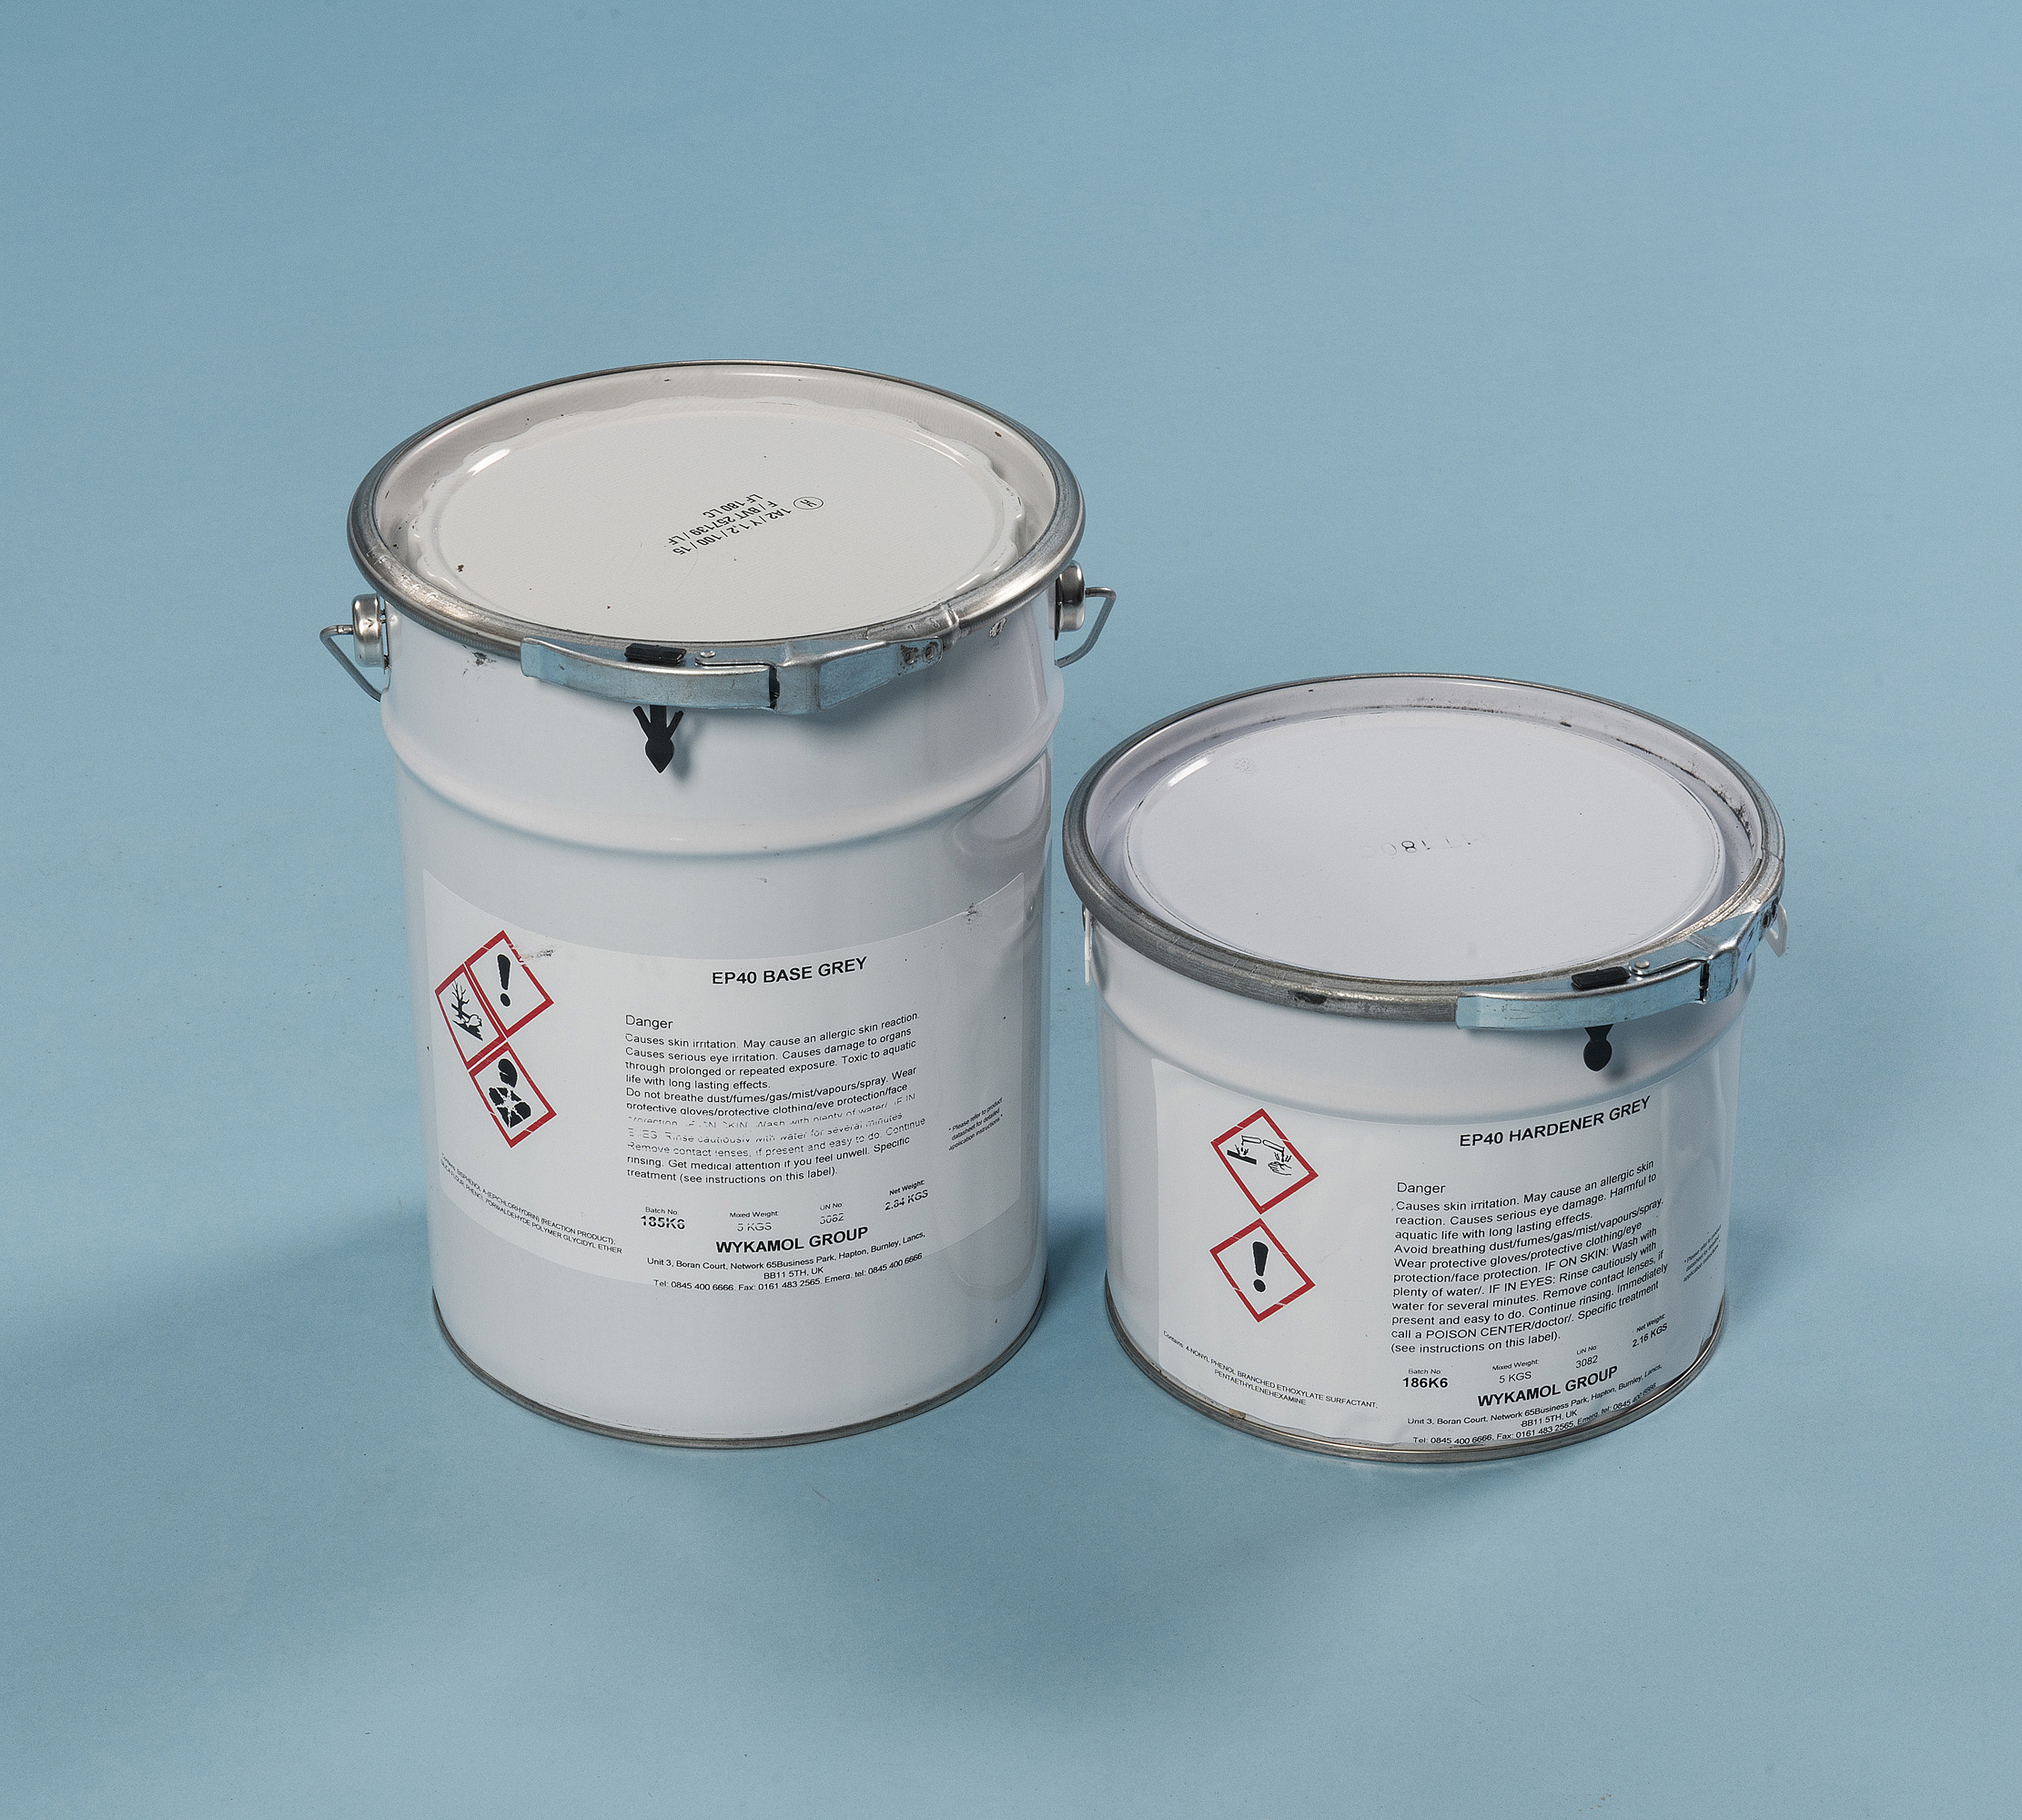 epoxy floor seal paint twistfix paint on coating. Black Bedroom Furniture Sets. Home Design Ideas